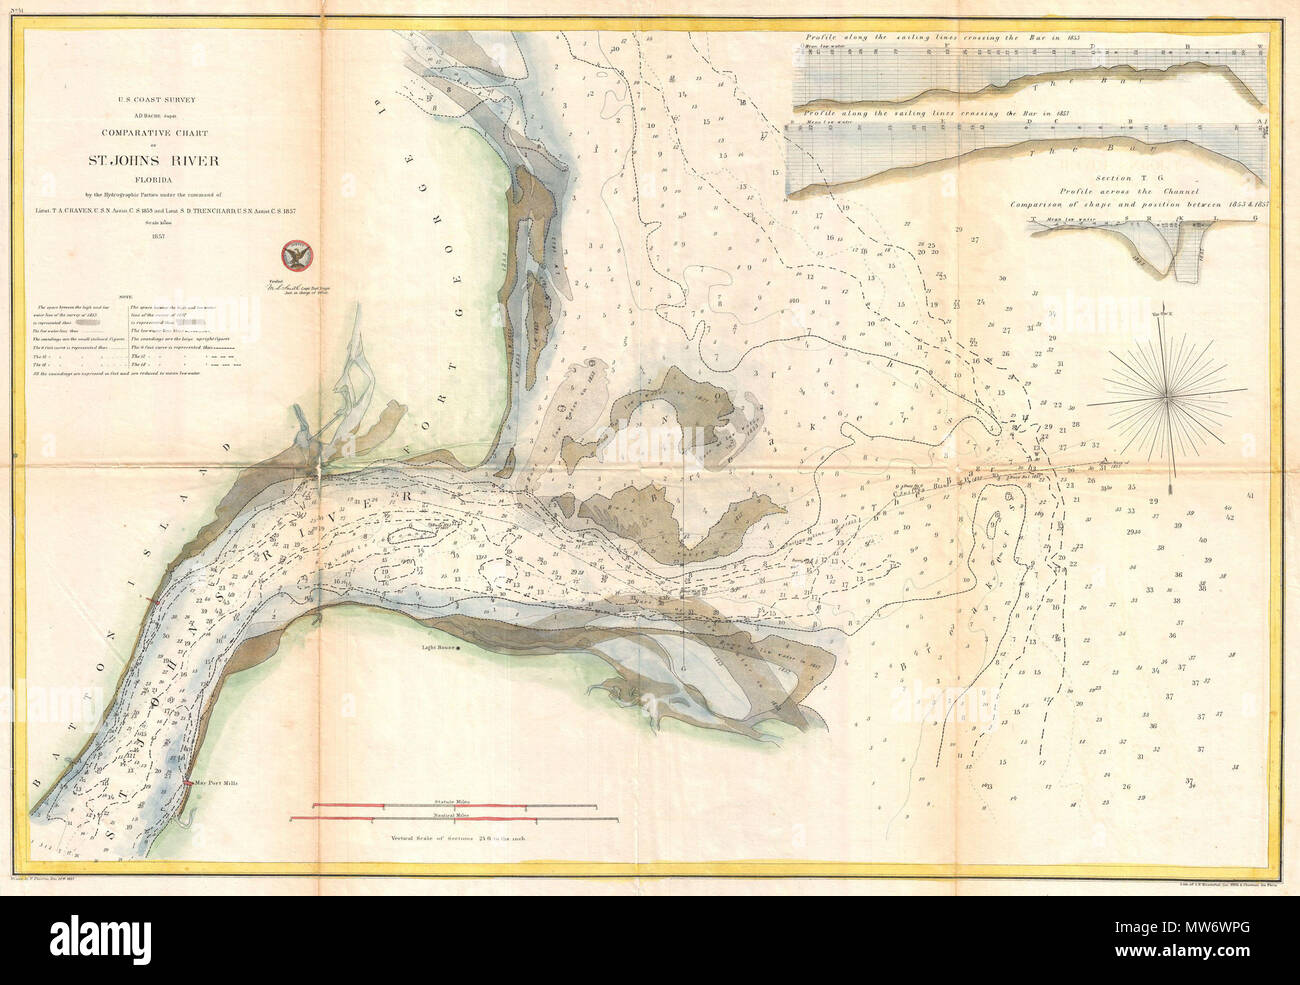 Florida Coastline Map.Comparative Chart Of St John S River Florida English An Unusual